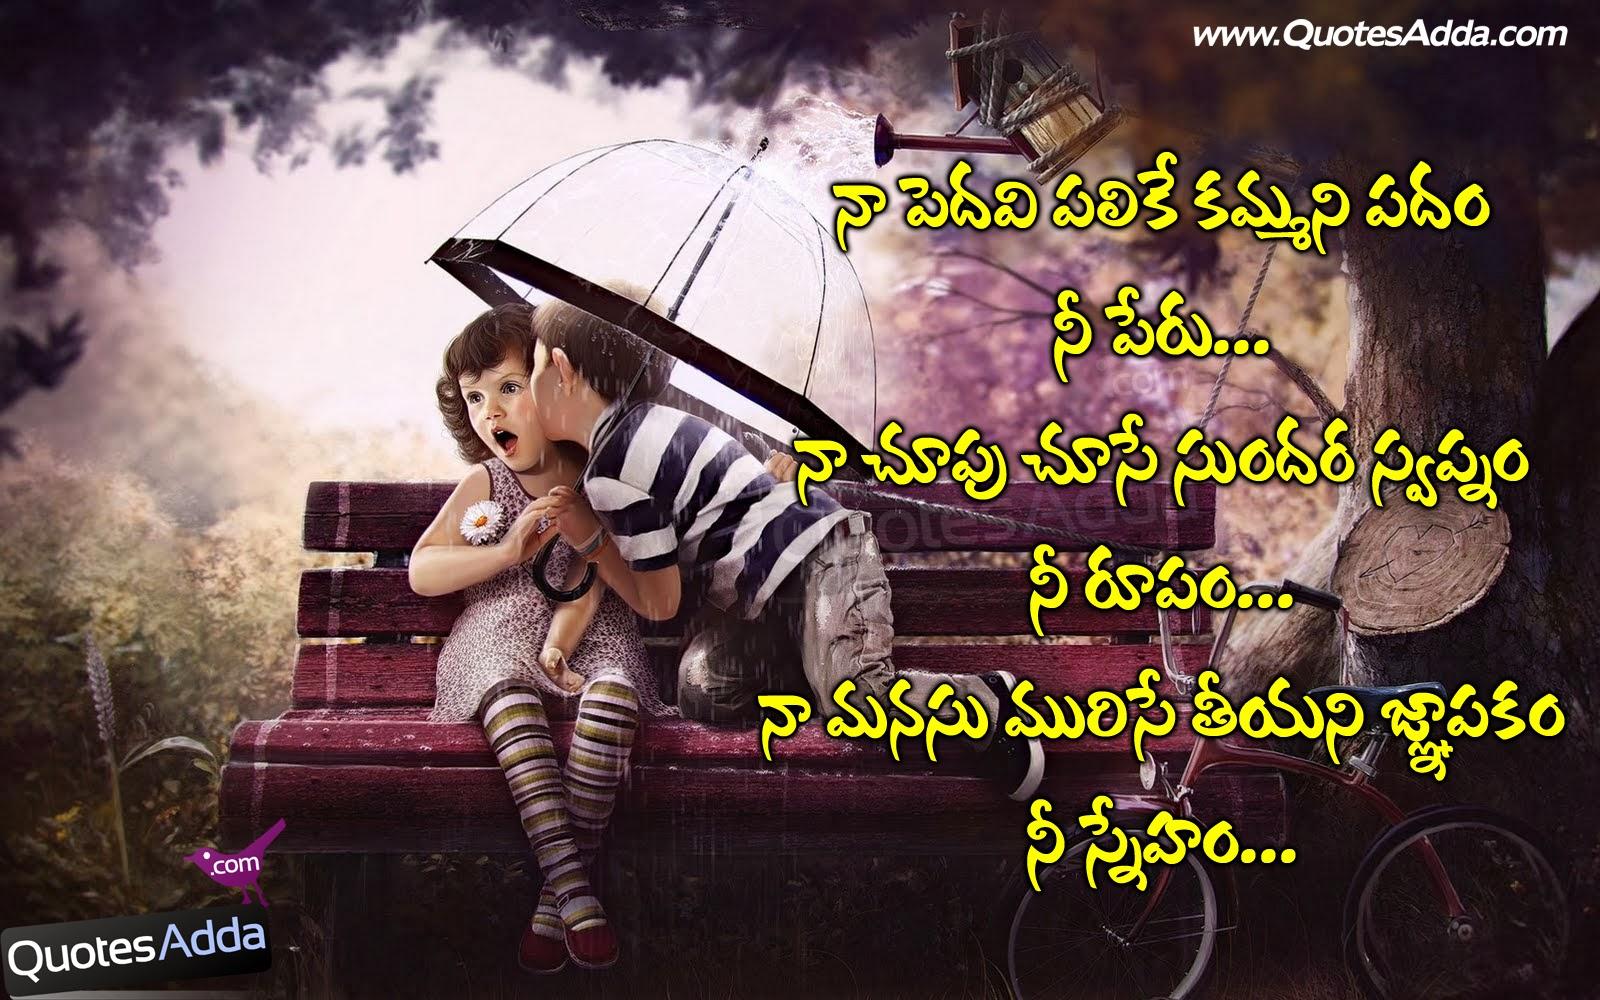 Telugu Love Quotes Wallpapers - 31 | QuotesAdda.com ...